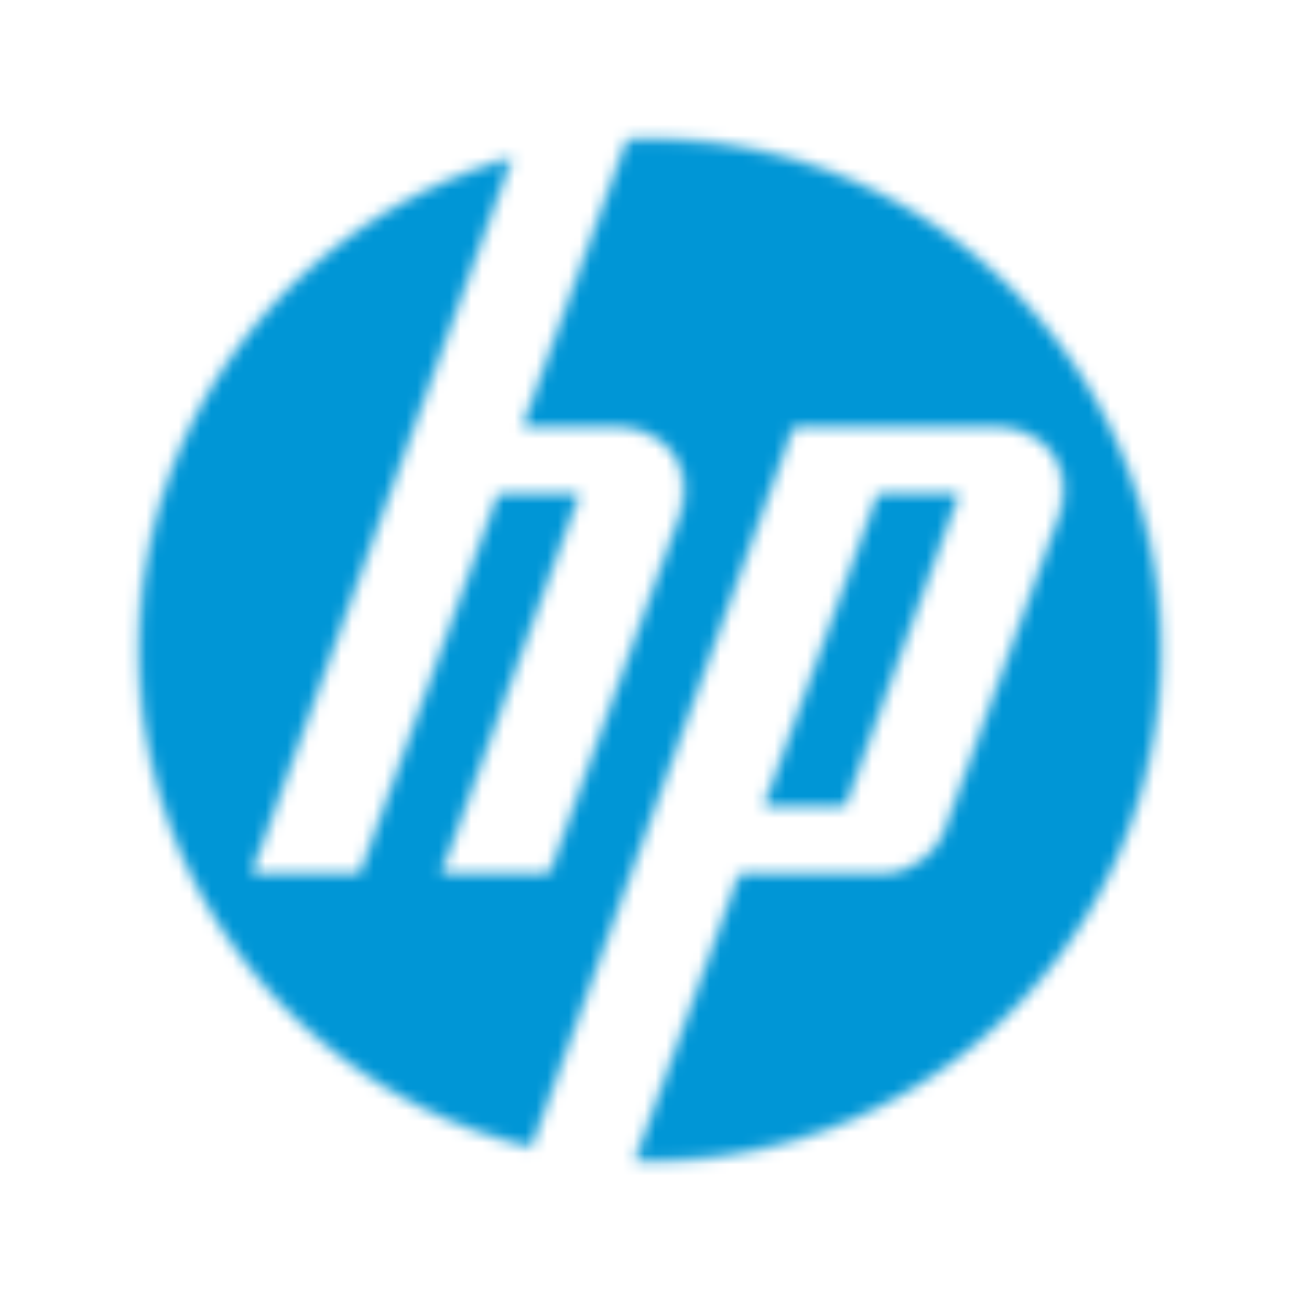 HP RAM Module for Mini PC, Desktop PC, All-in-One PC - 16 GB - DDR4-3200/PC4-25600 DDR4 SDRAM - 3200 MHz